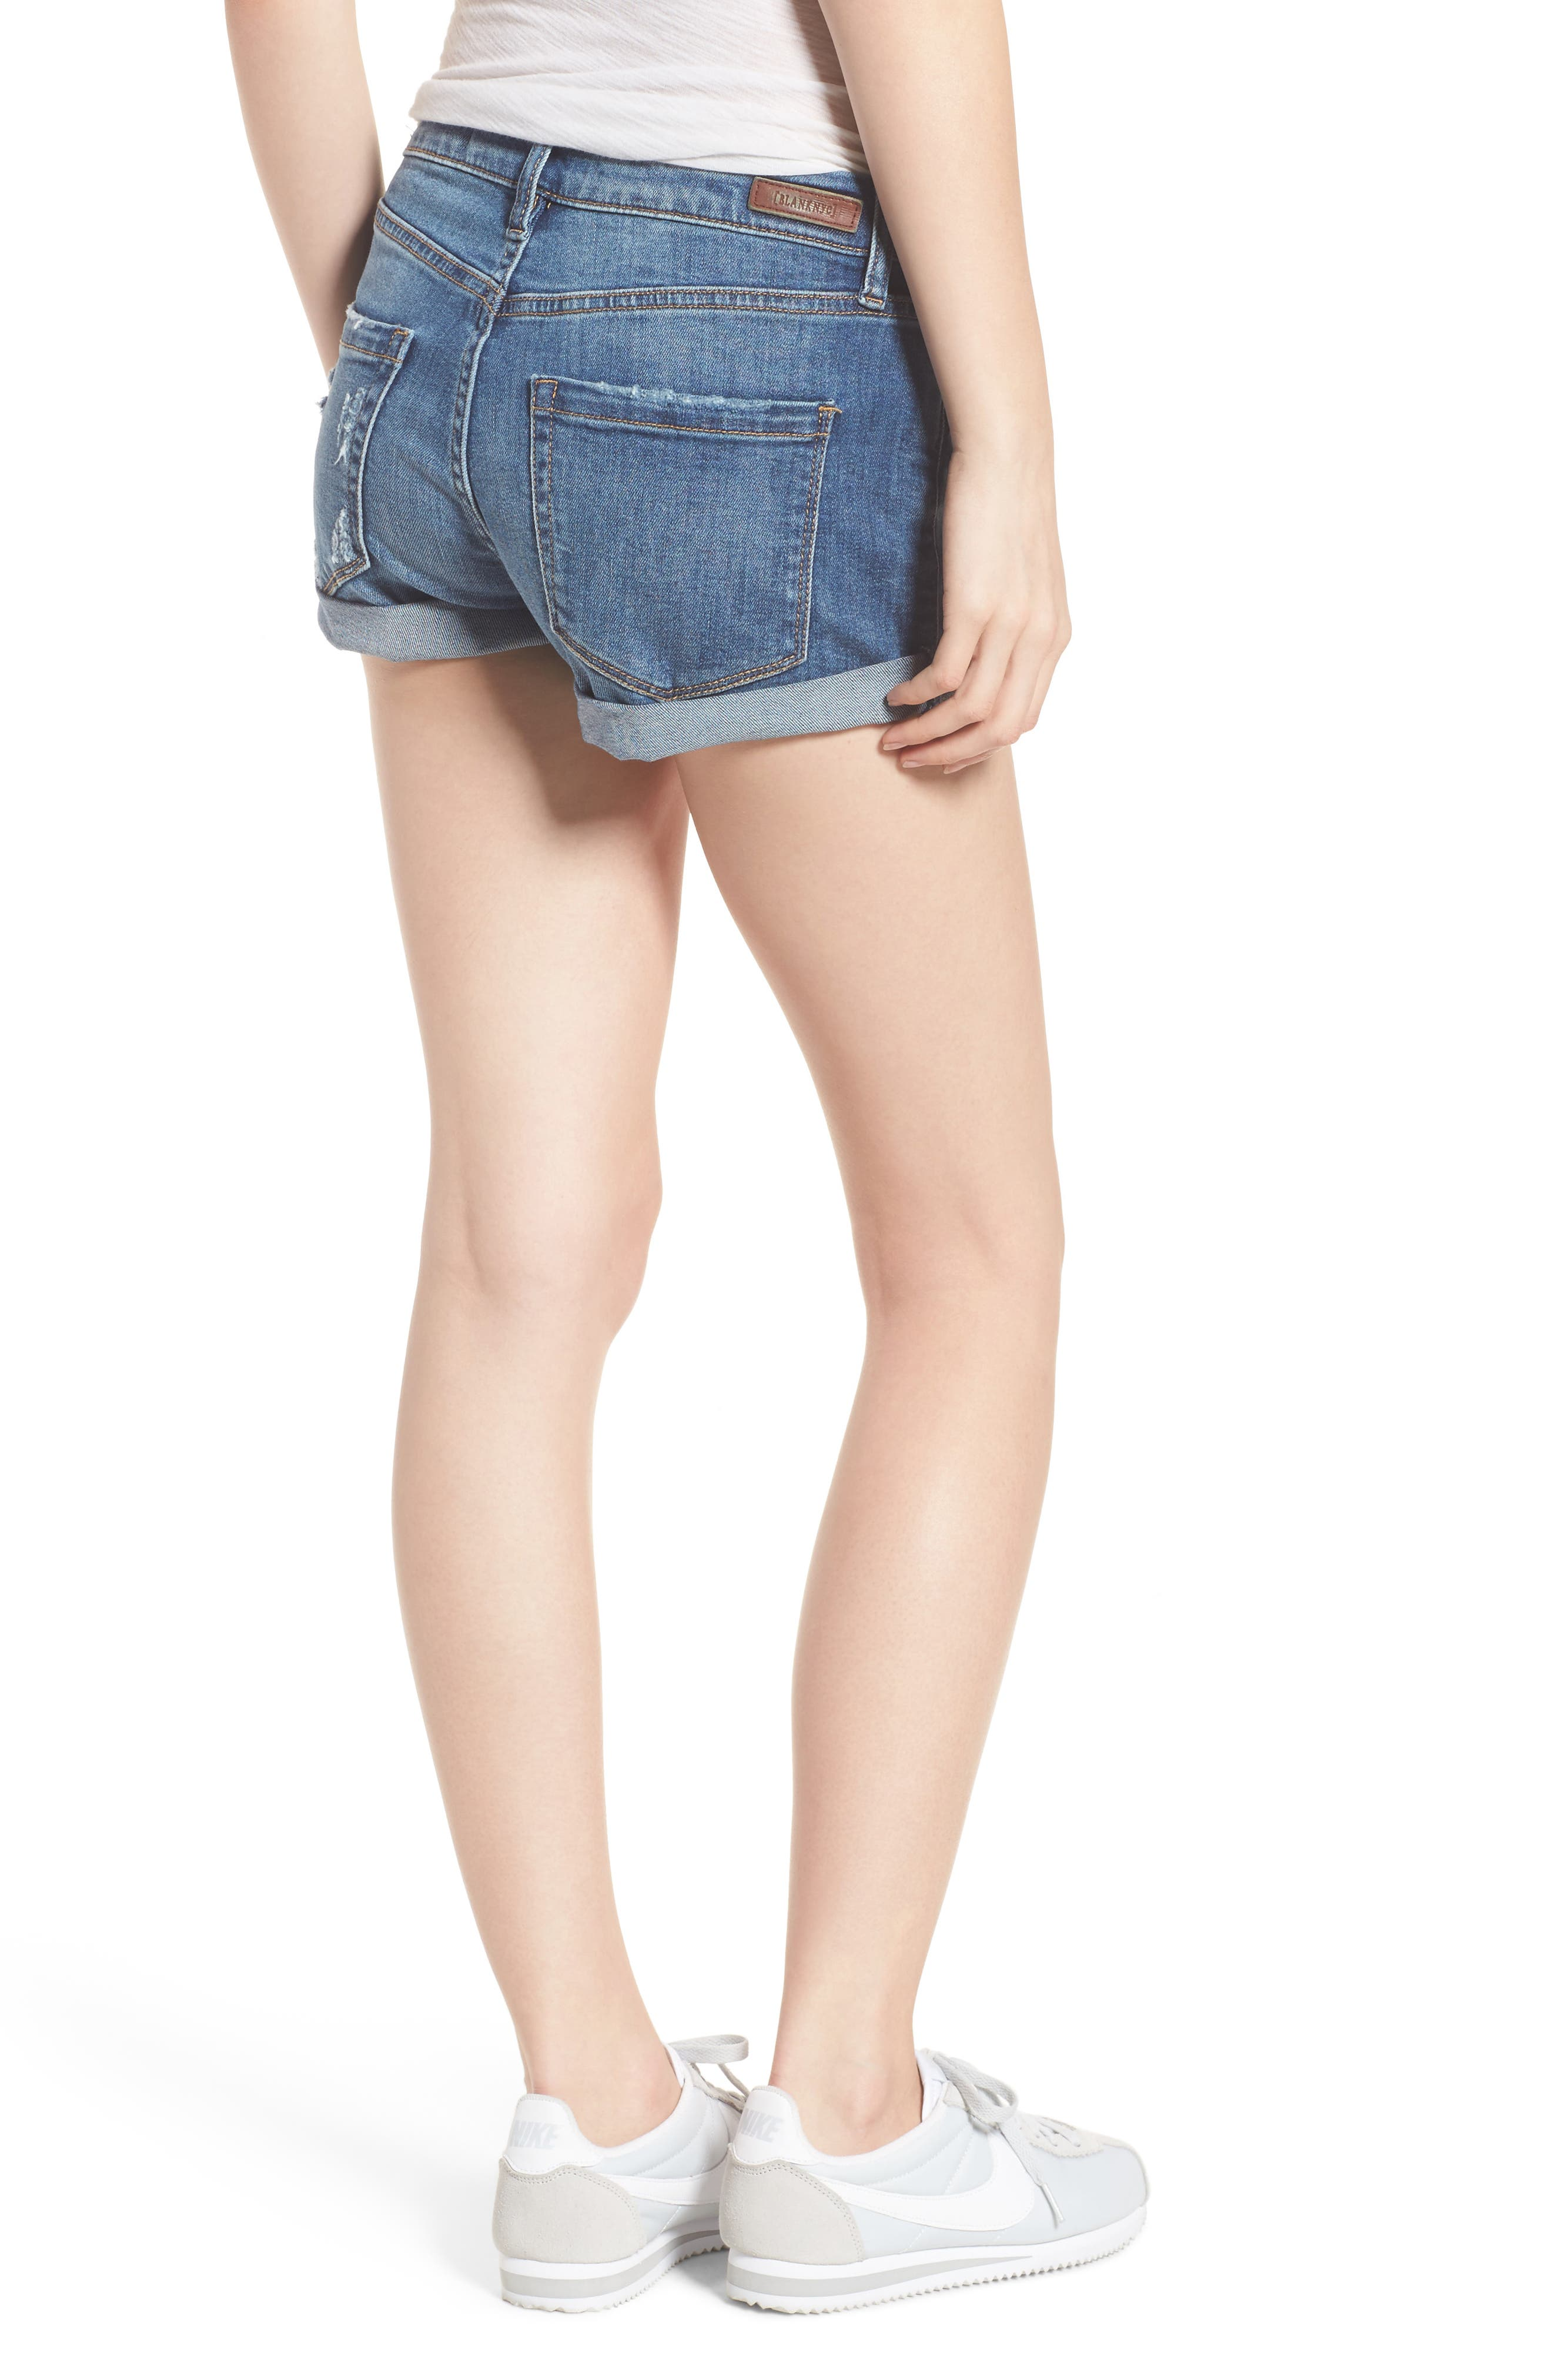 Plalay Hard Cuffed Jean Shorts,                             Alternate thumbnail 2, color,                             Blue